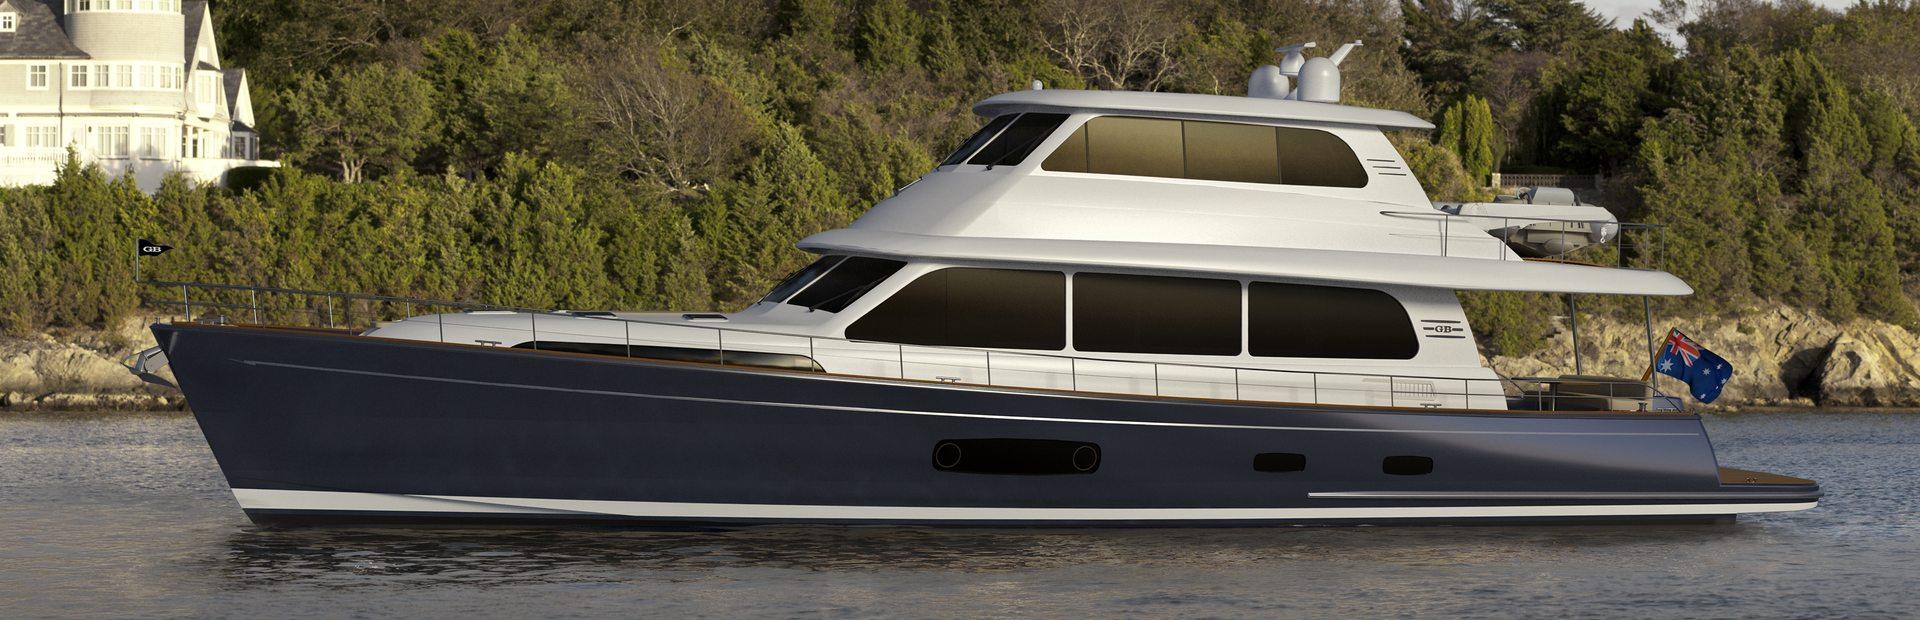 Grand Banks 85 Yacht Charter